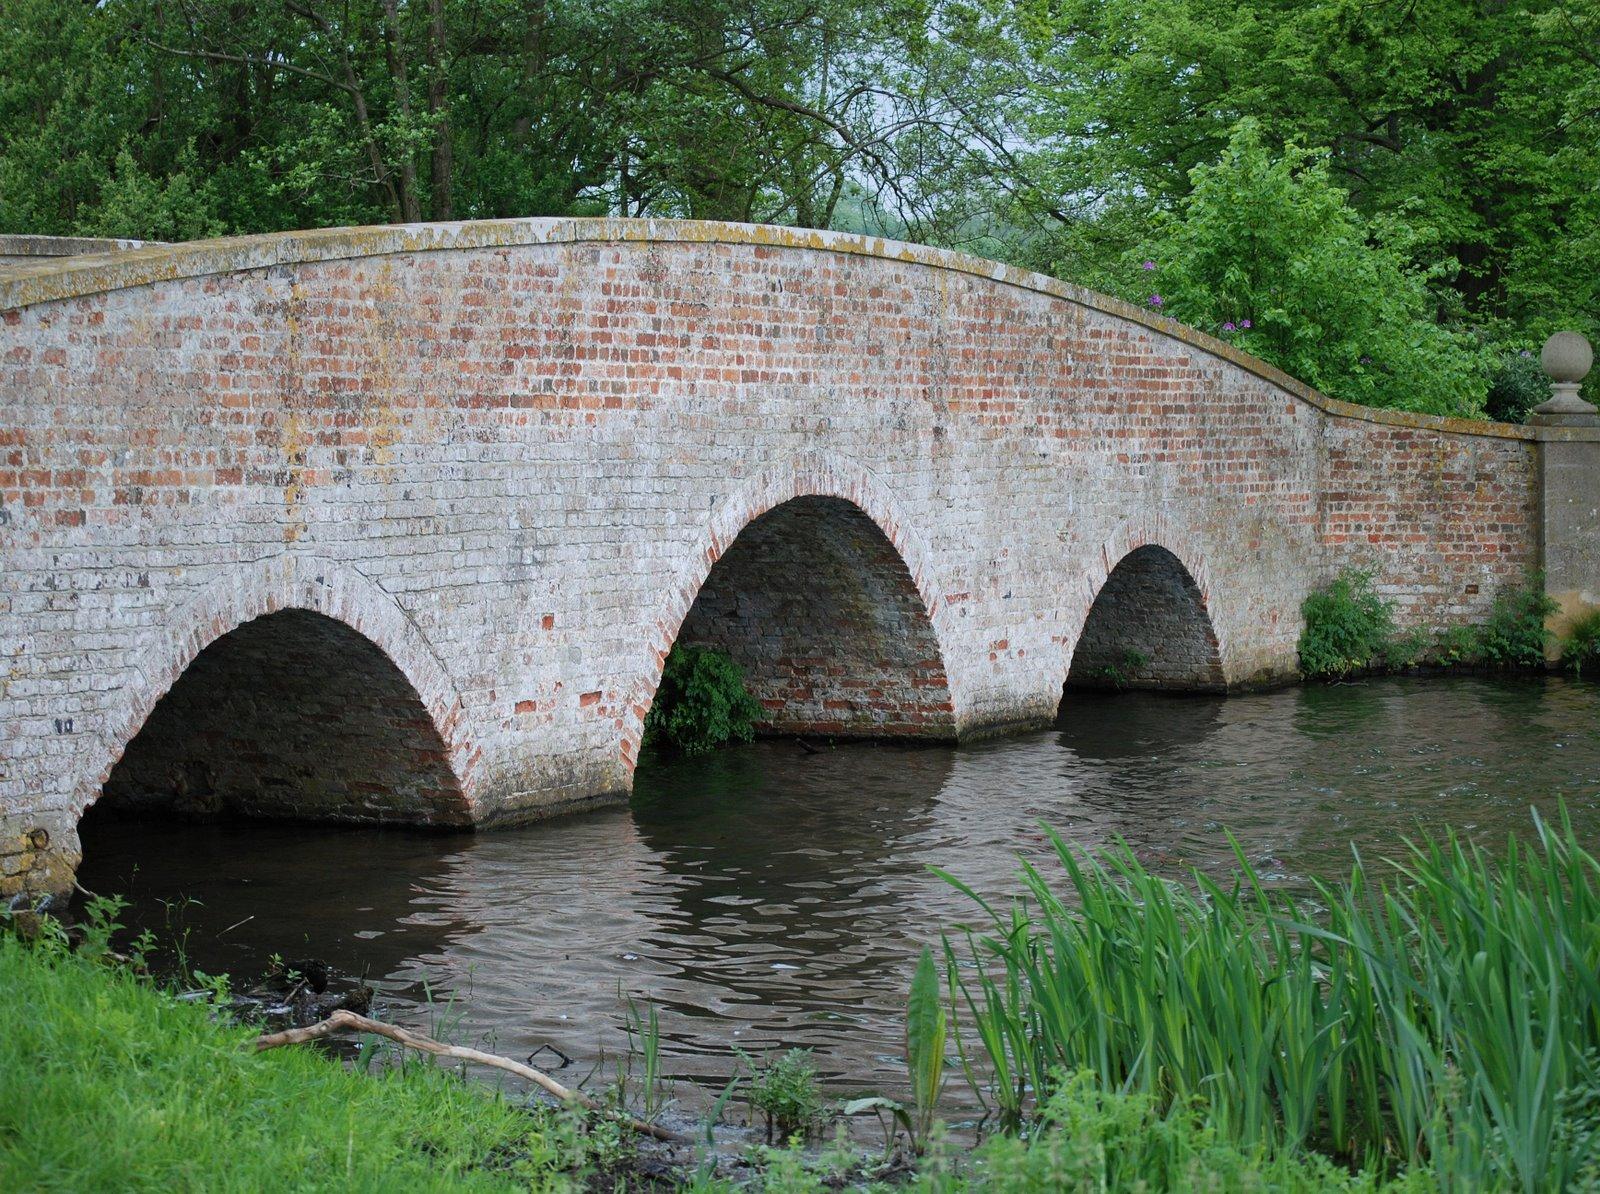 bridge over tundry pond, dogmersfield park, hampshire